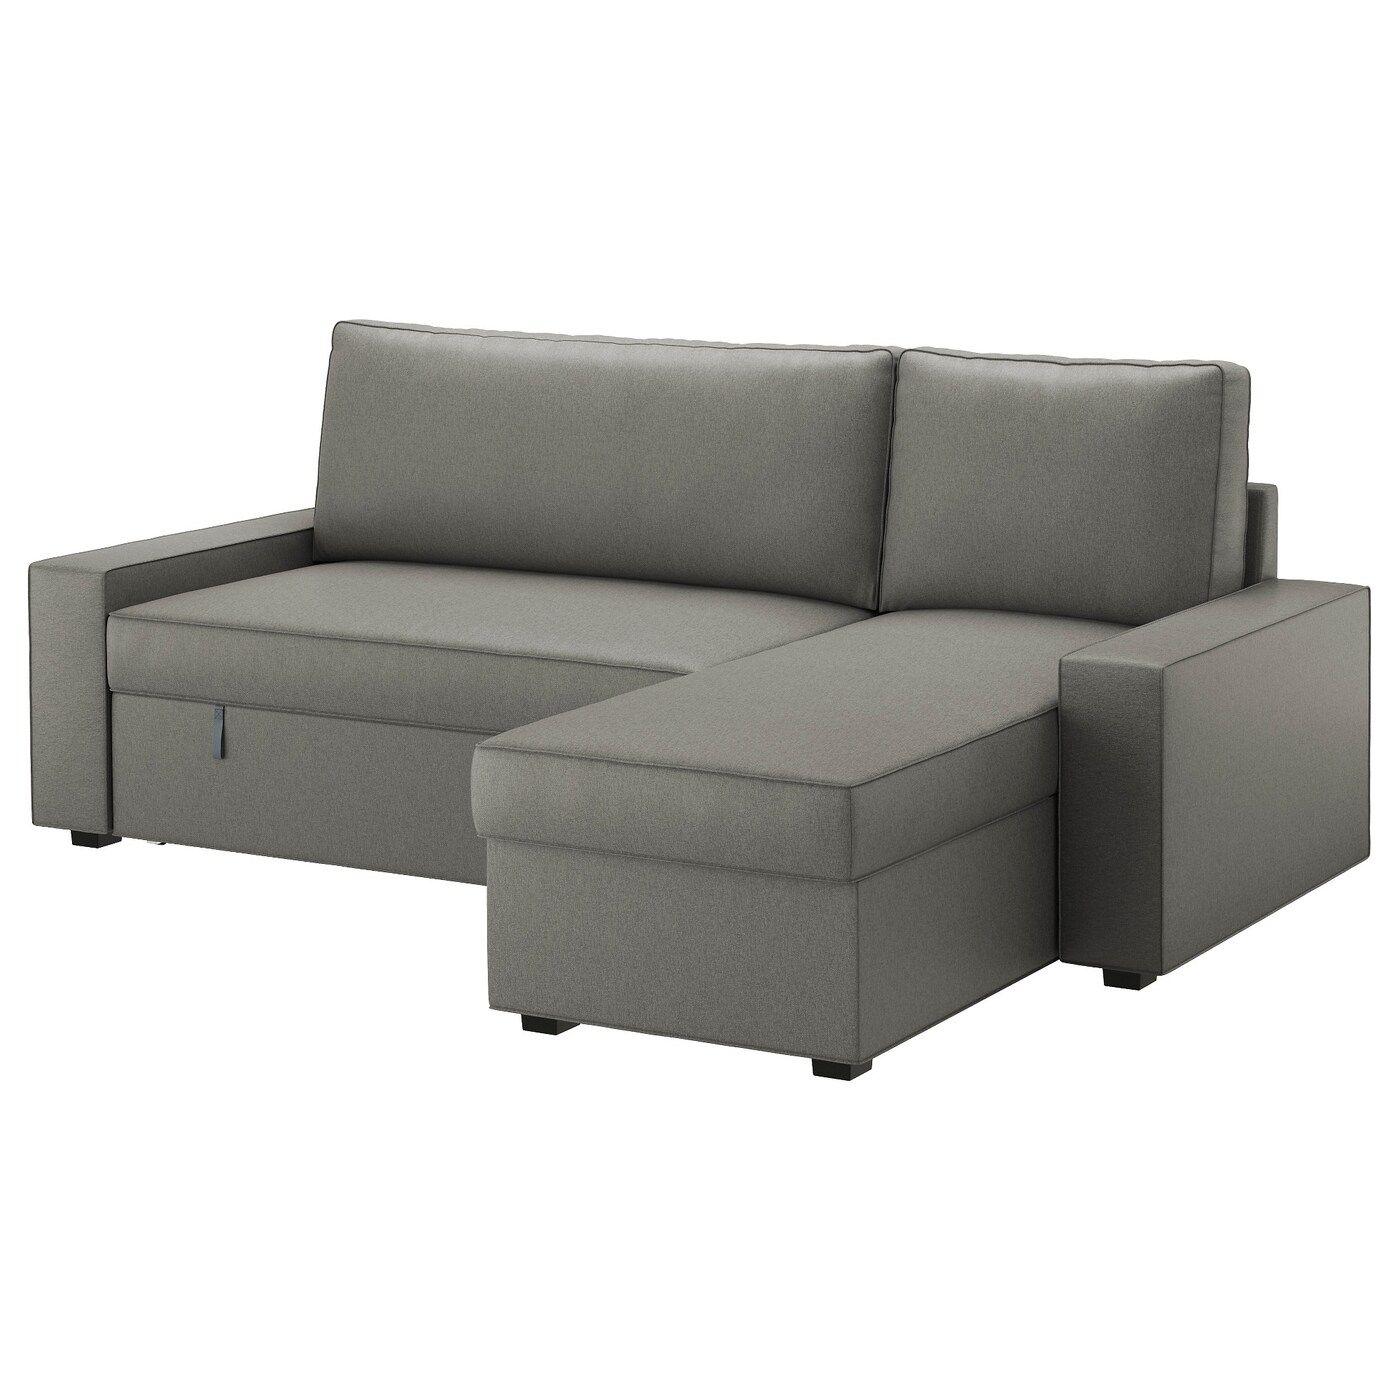 Slaapbank Ikea Karlstad.Vilasund Hoes Slaapbank Met Chaise Longue In 2020 Sofa Bed Sofa